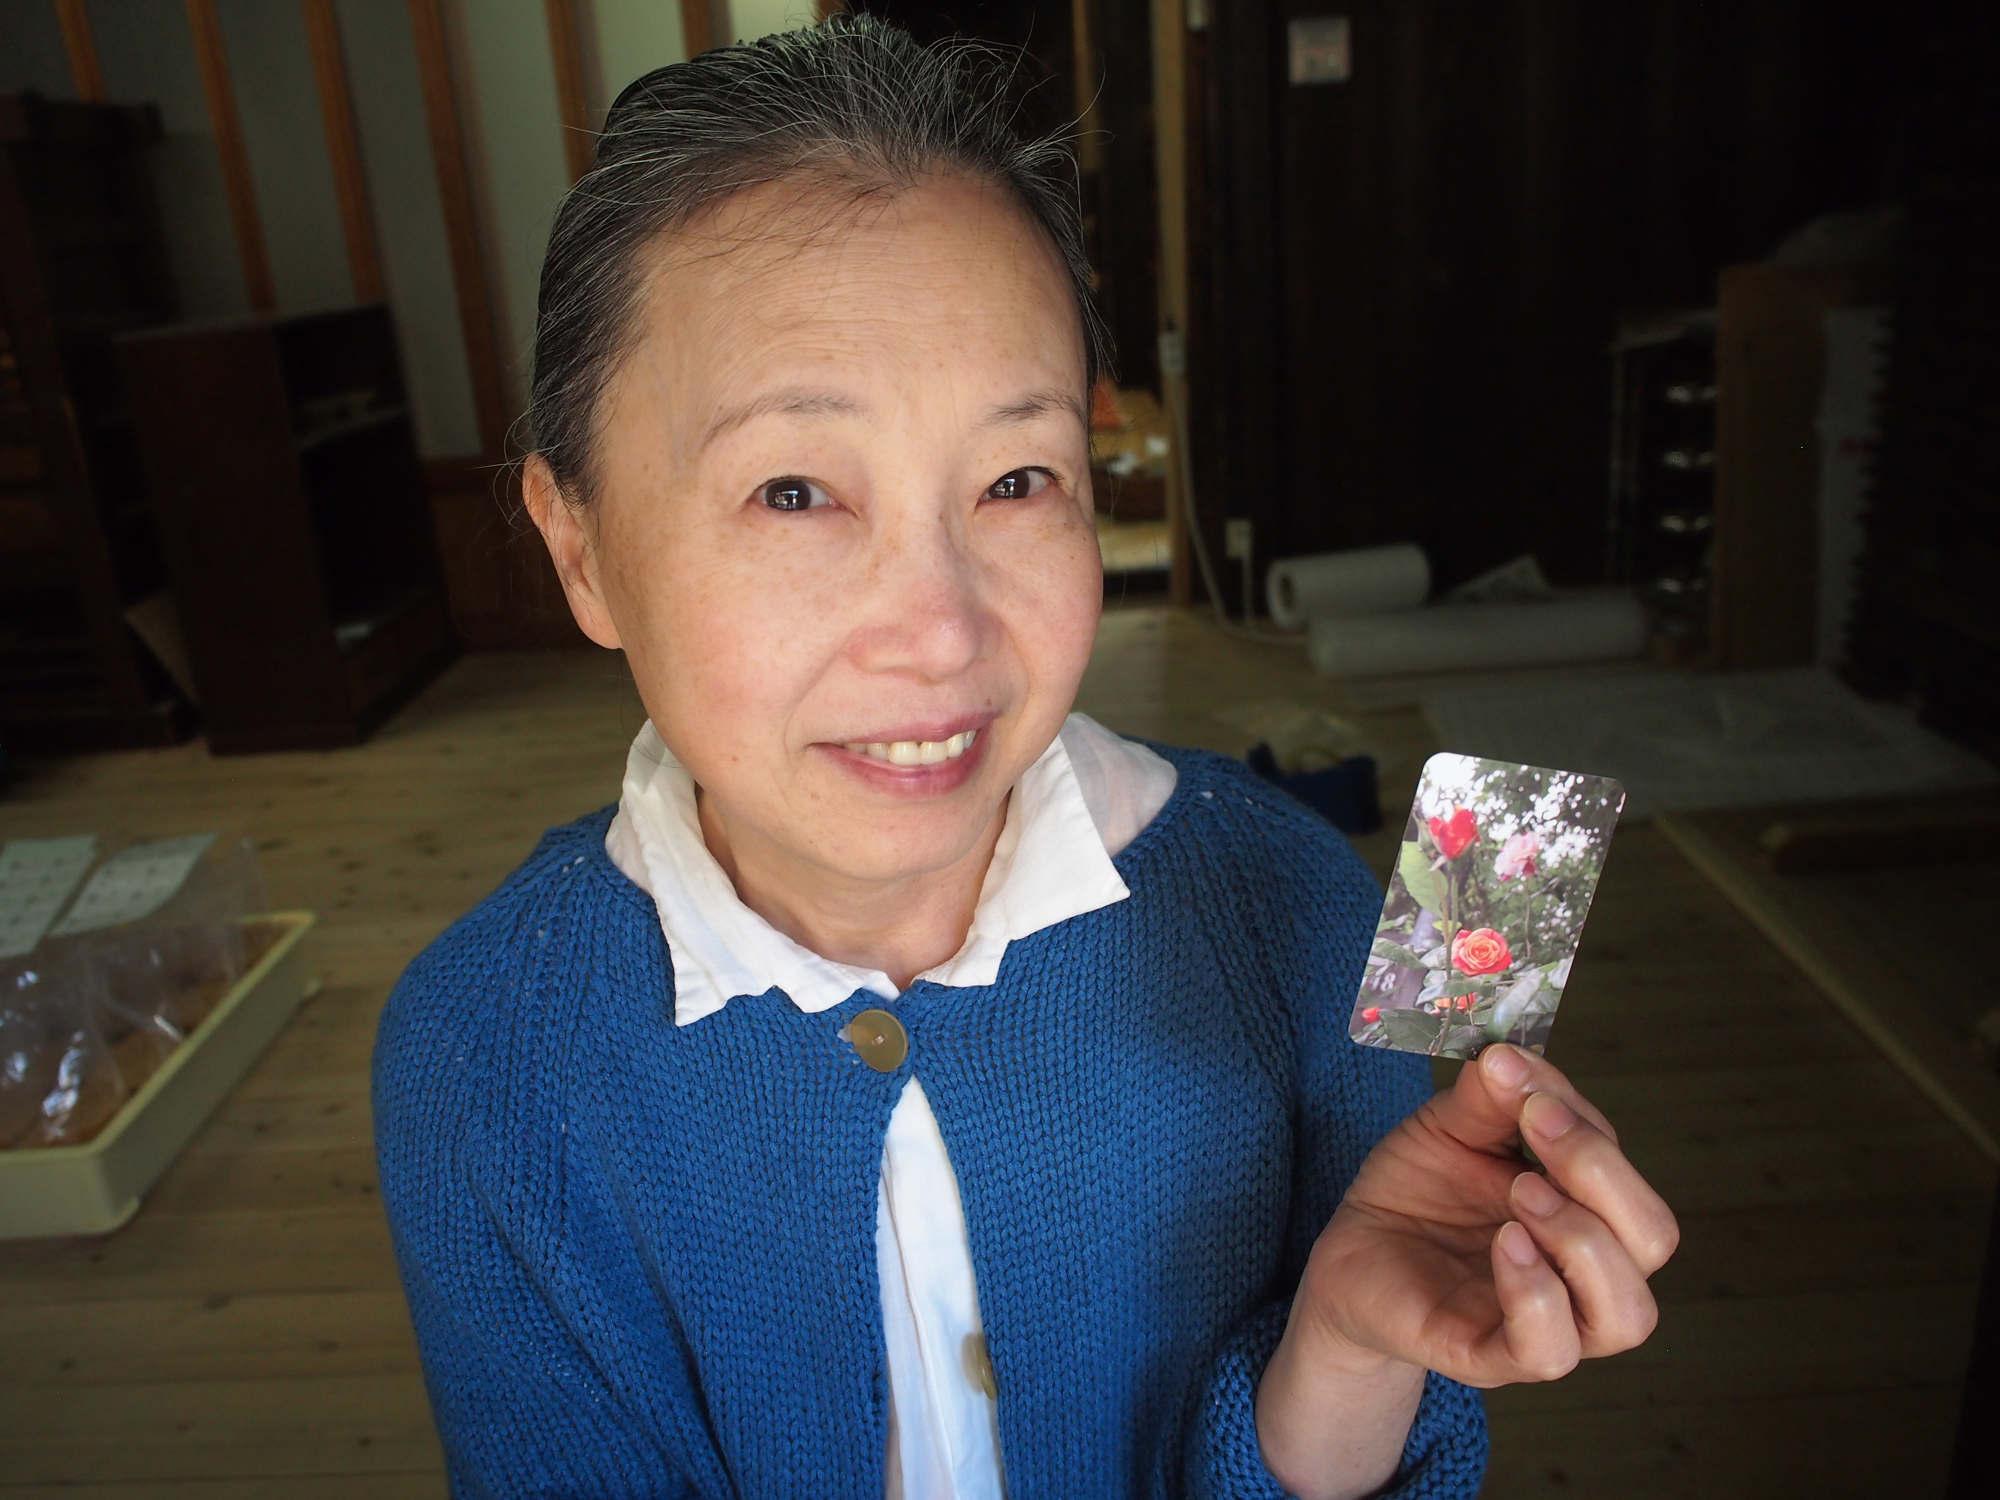 Forum on this topic: Lakshmi Manchu, bunko-kanazawa/